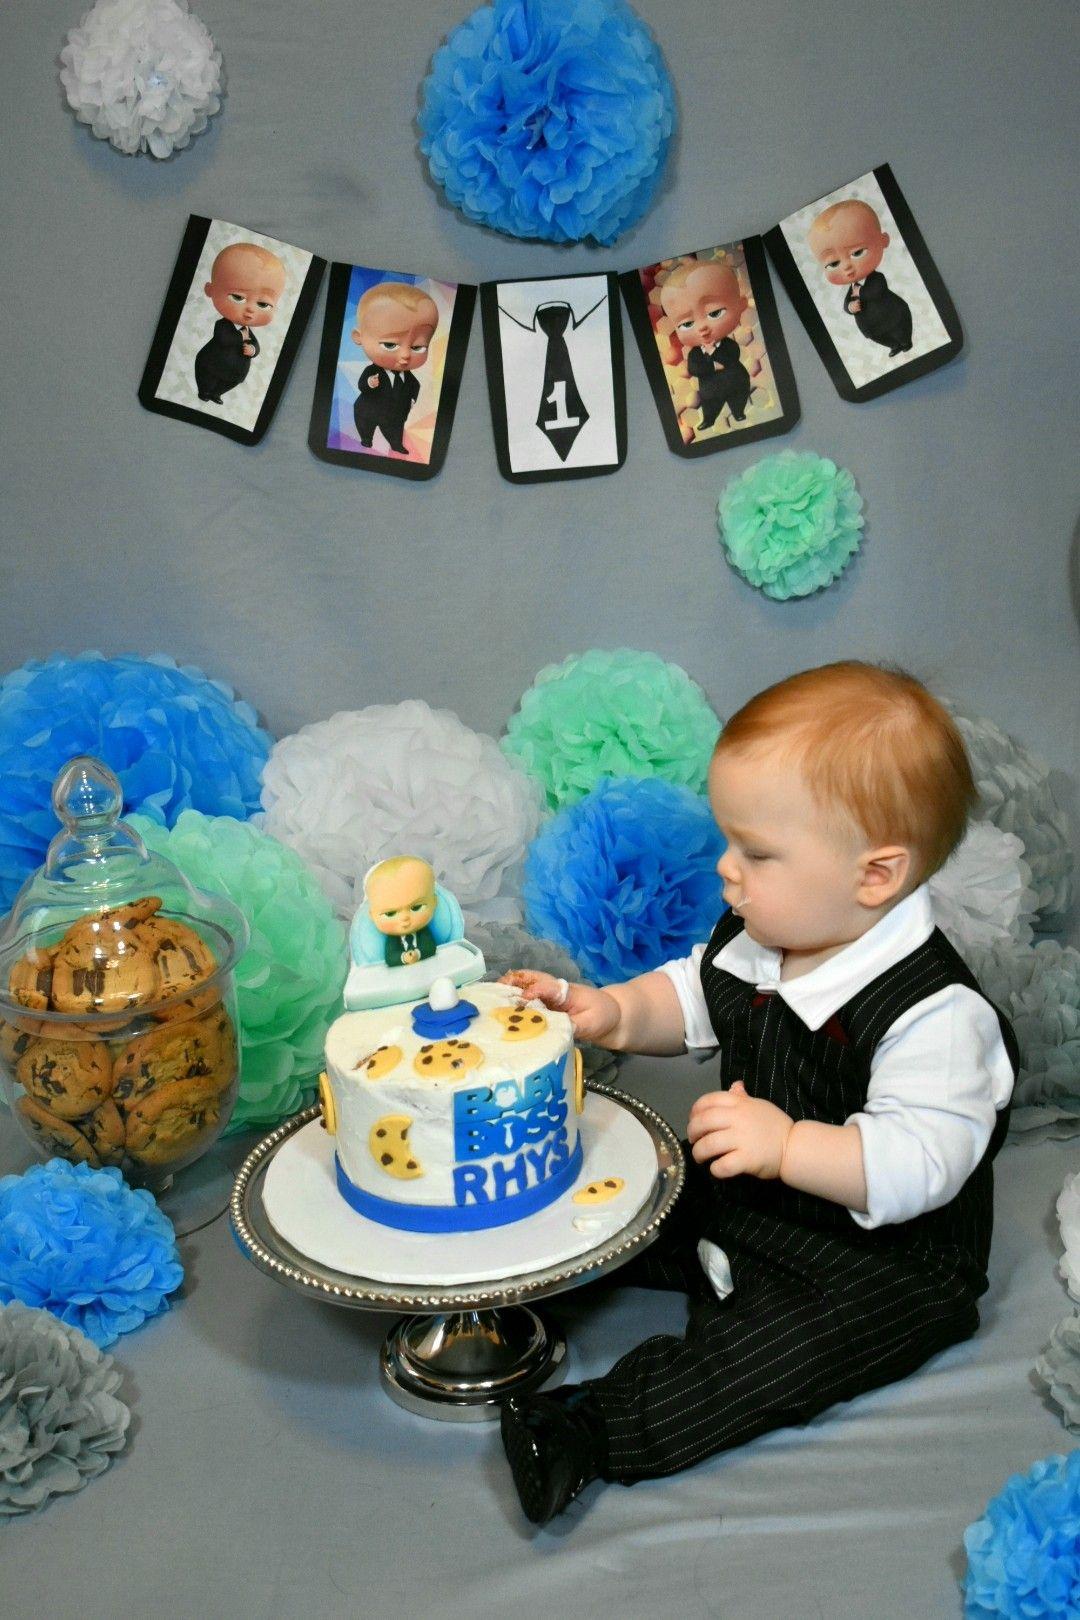 Cake Smash Boss Baby Cake Smash Birthday Boy Boss Baby Themed